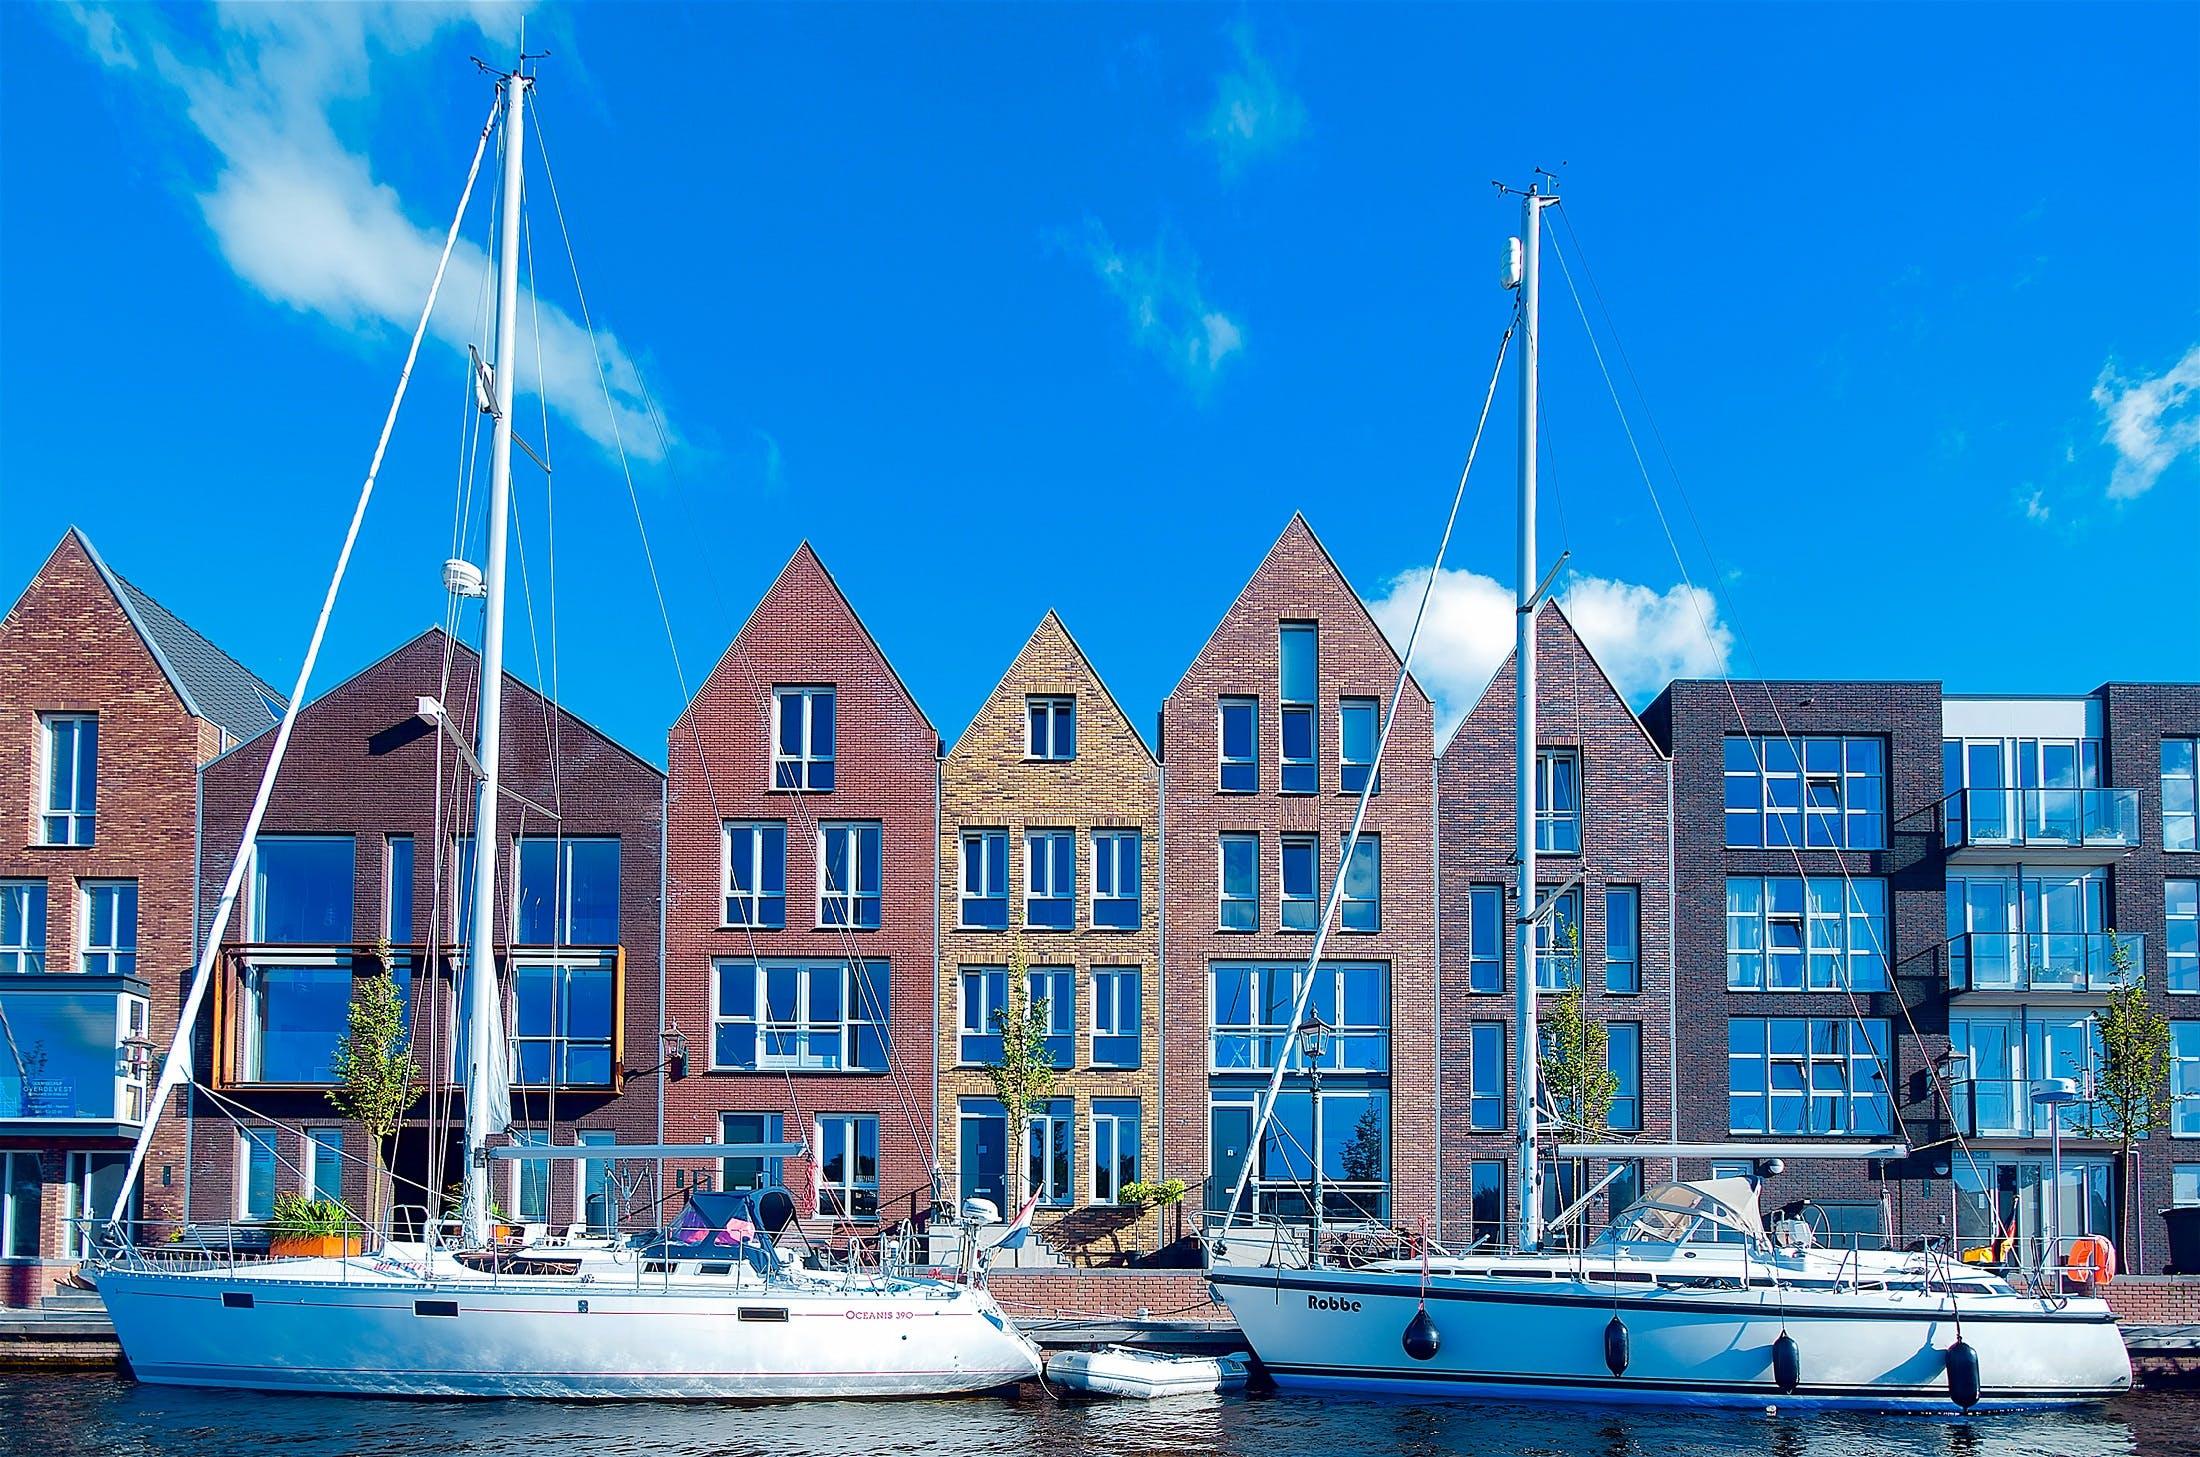 Free stock photo of city, water, bay, boats